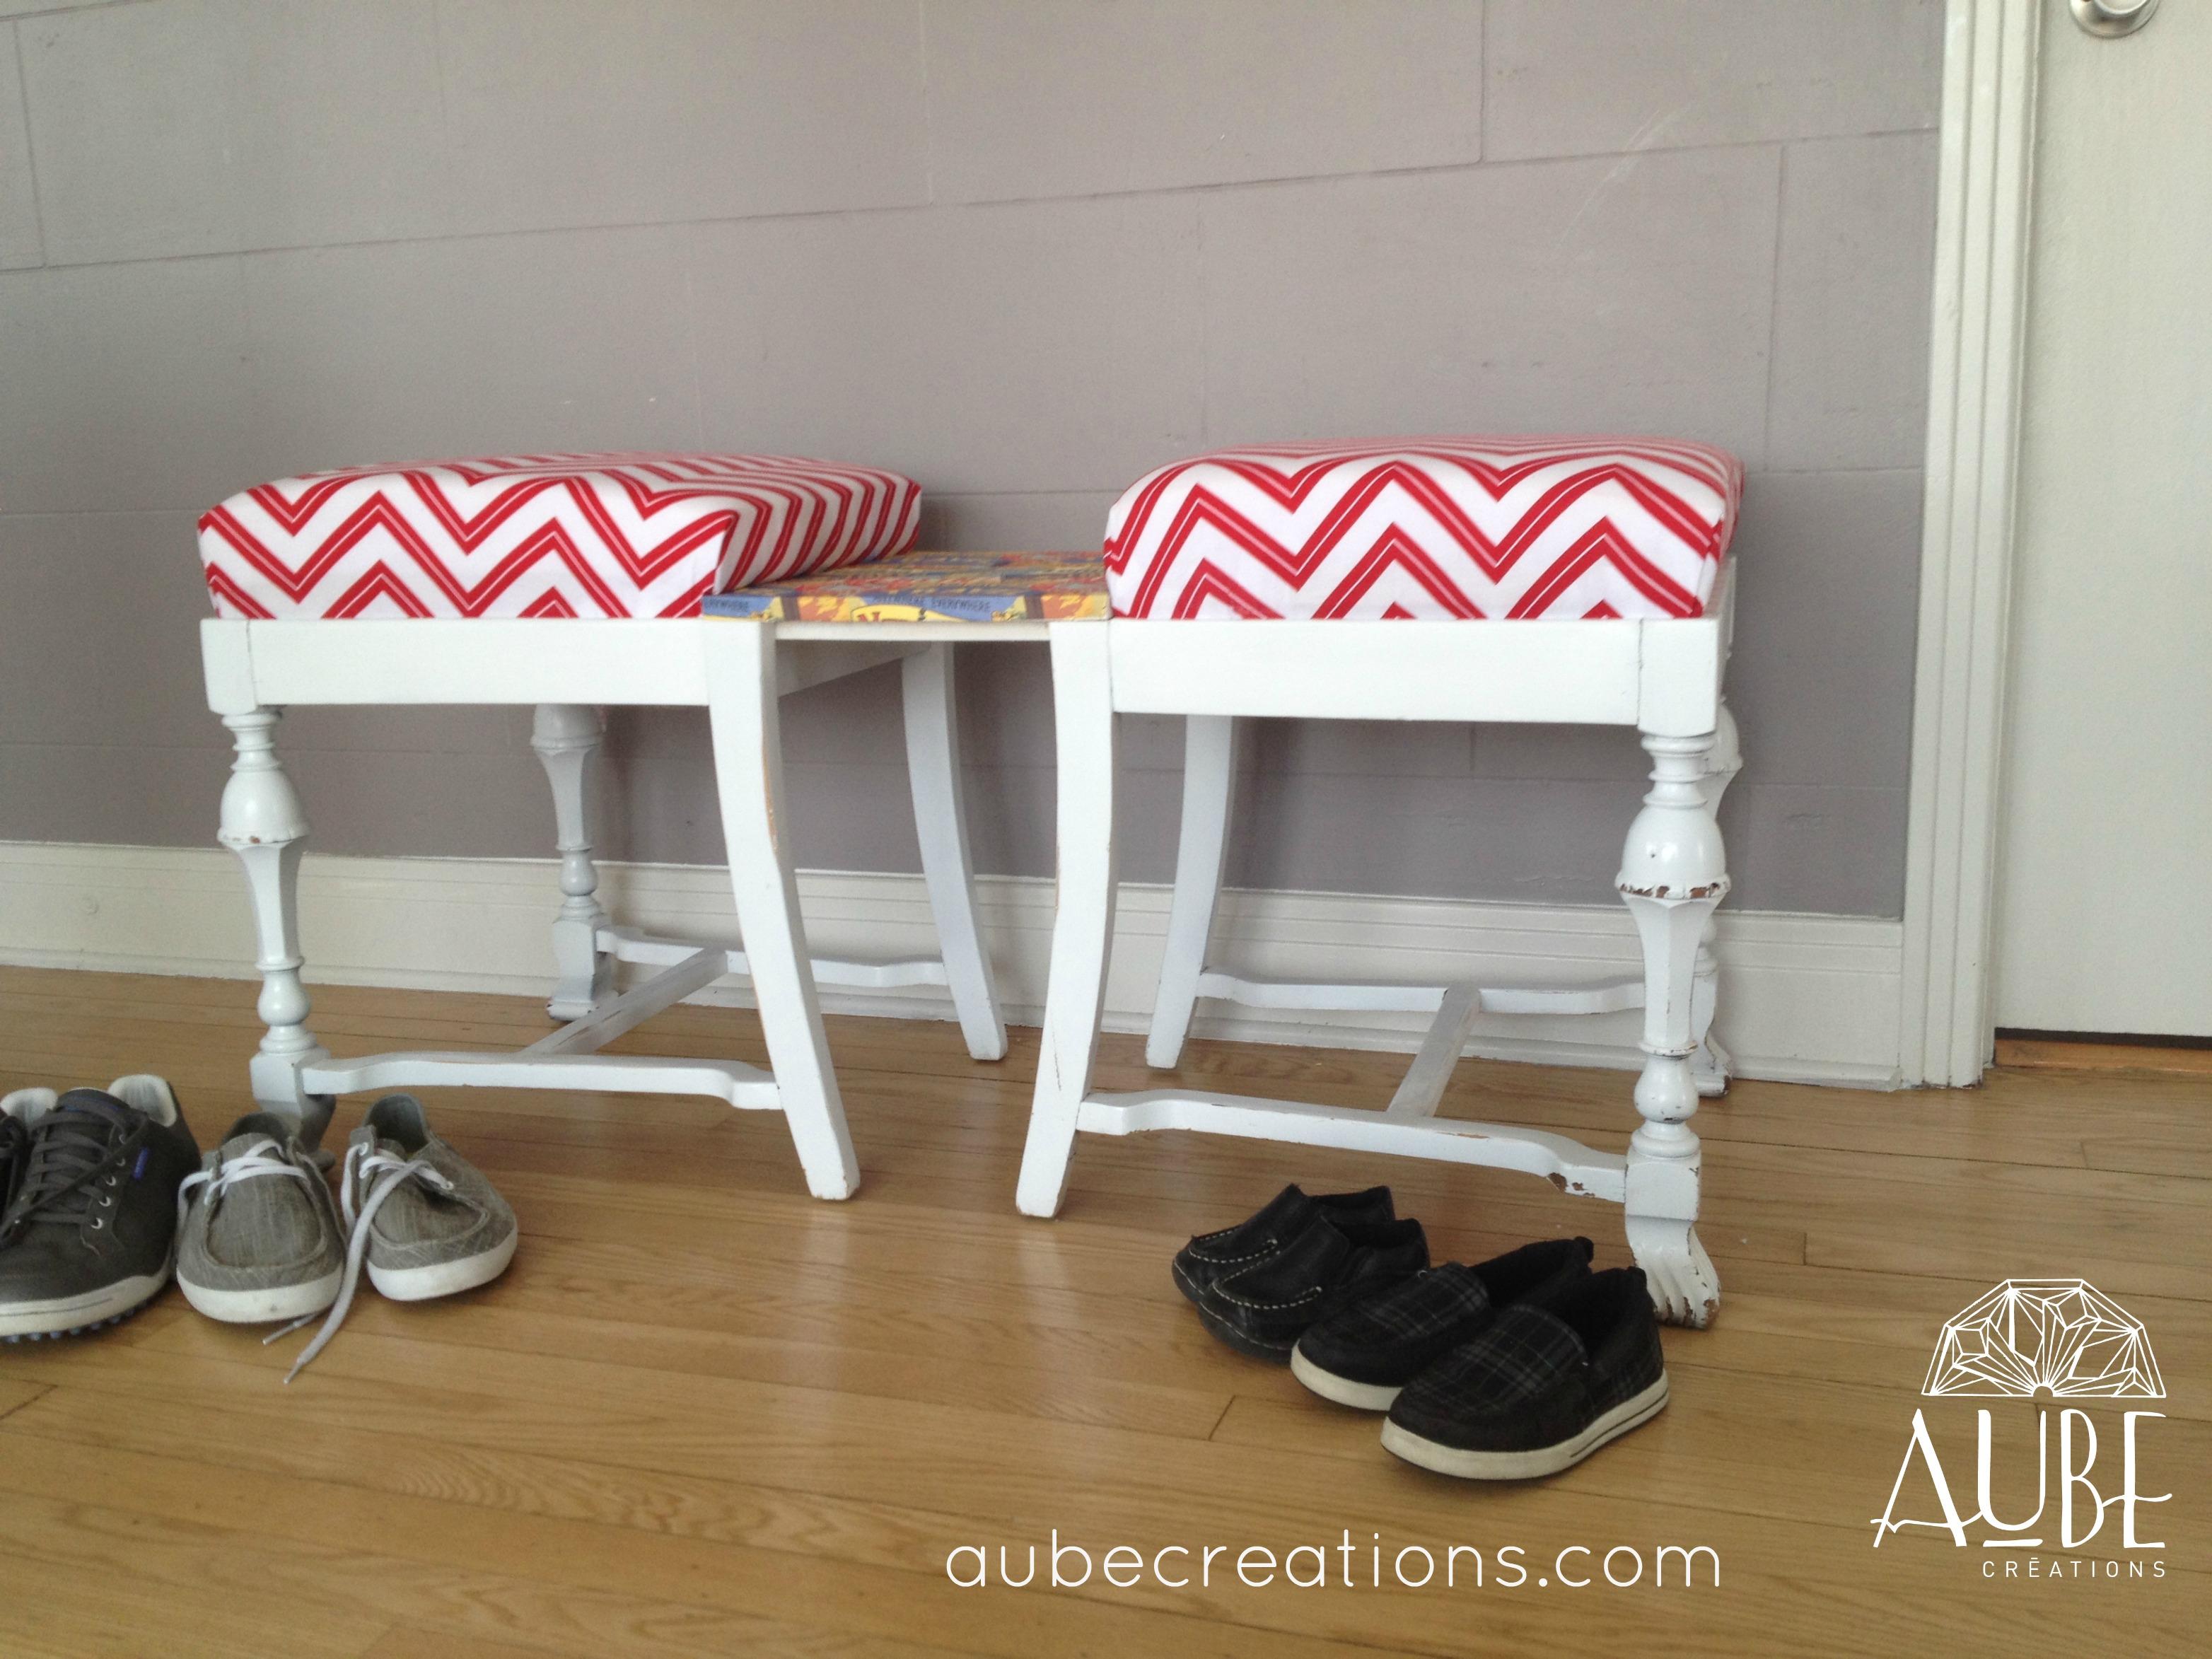 Transformation vieille chaise blogue cr ations aube design for Vieille chaise en bois